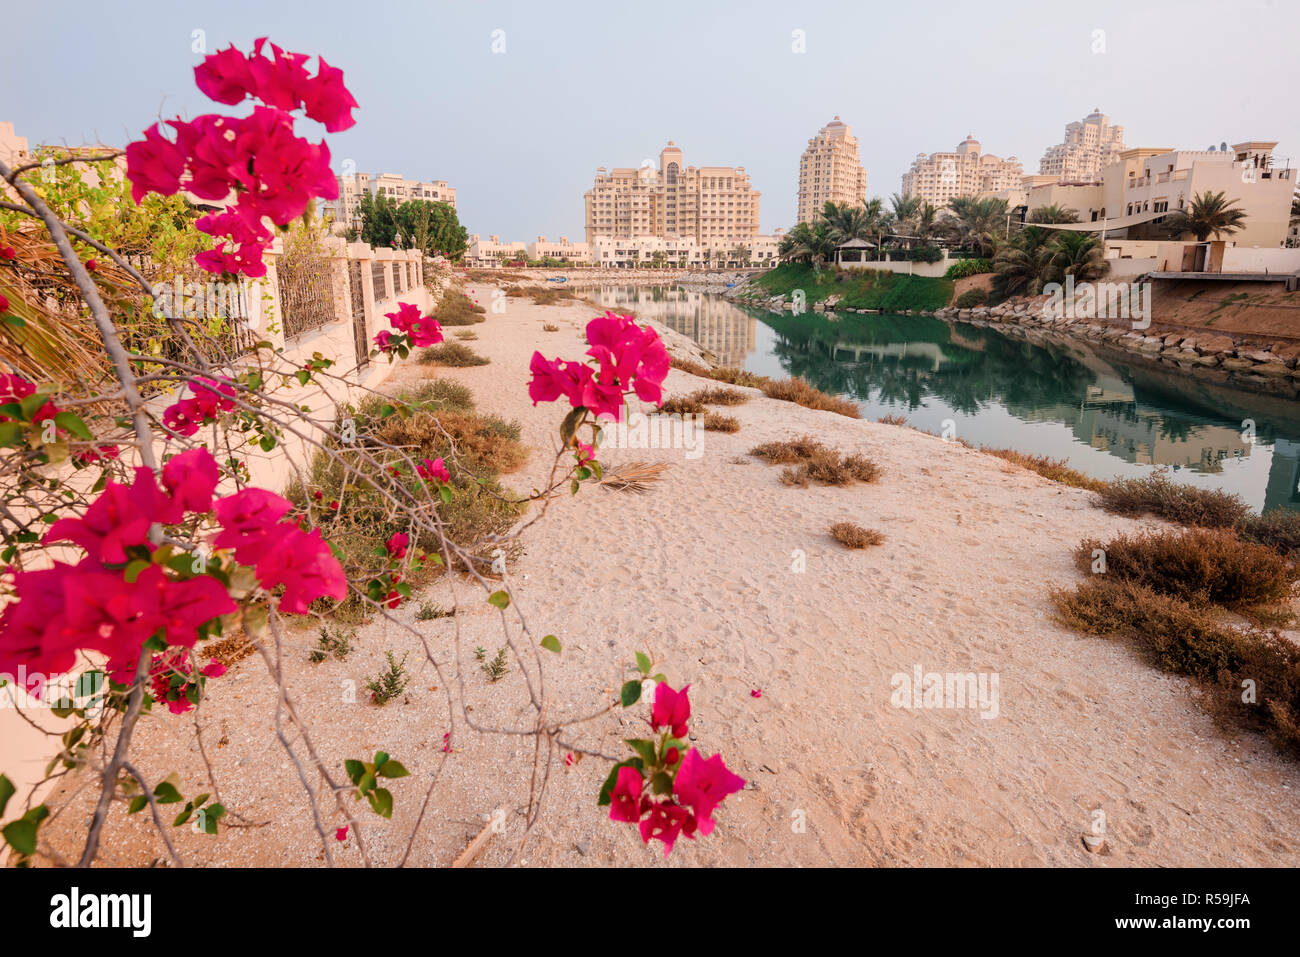 Al Hamra Village at Sunrise - Stock Image